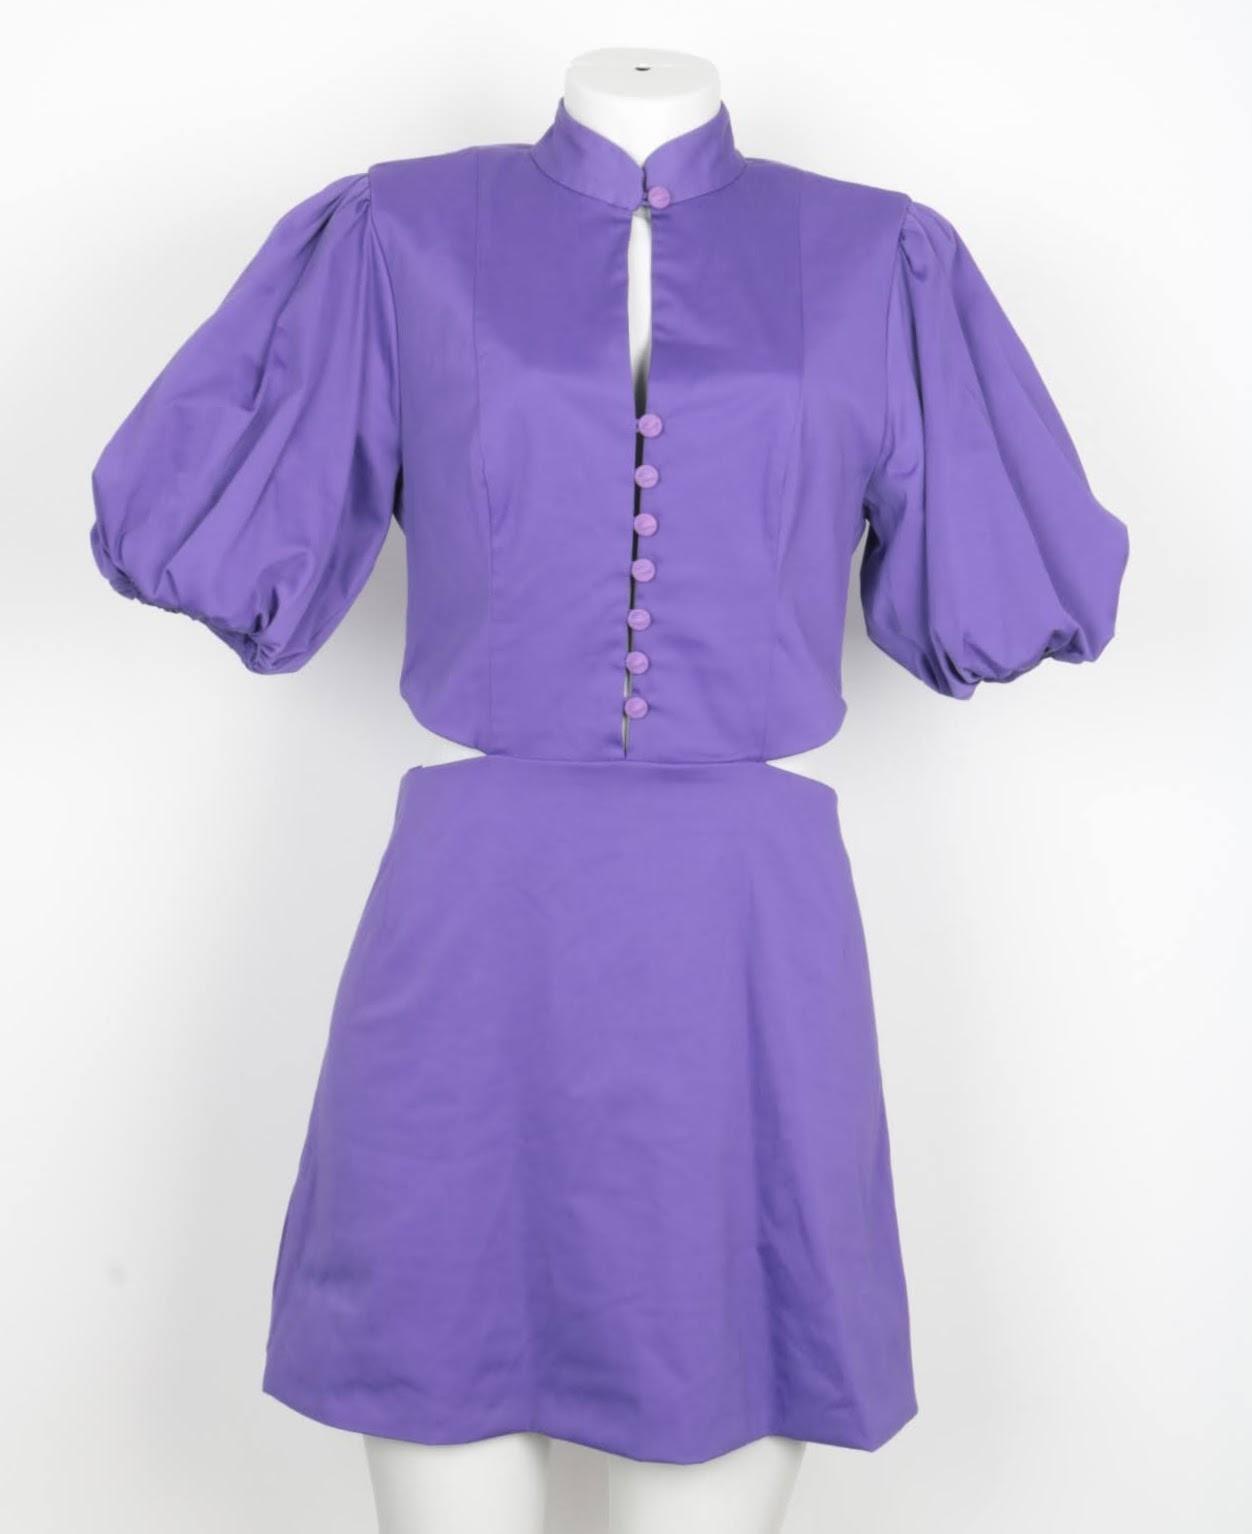 Vestido Curto - Anne Fernandes - M